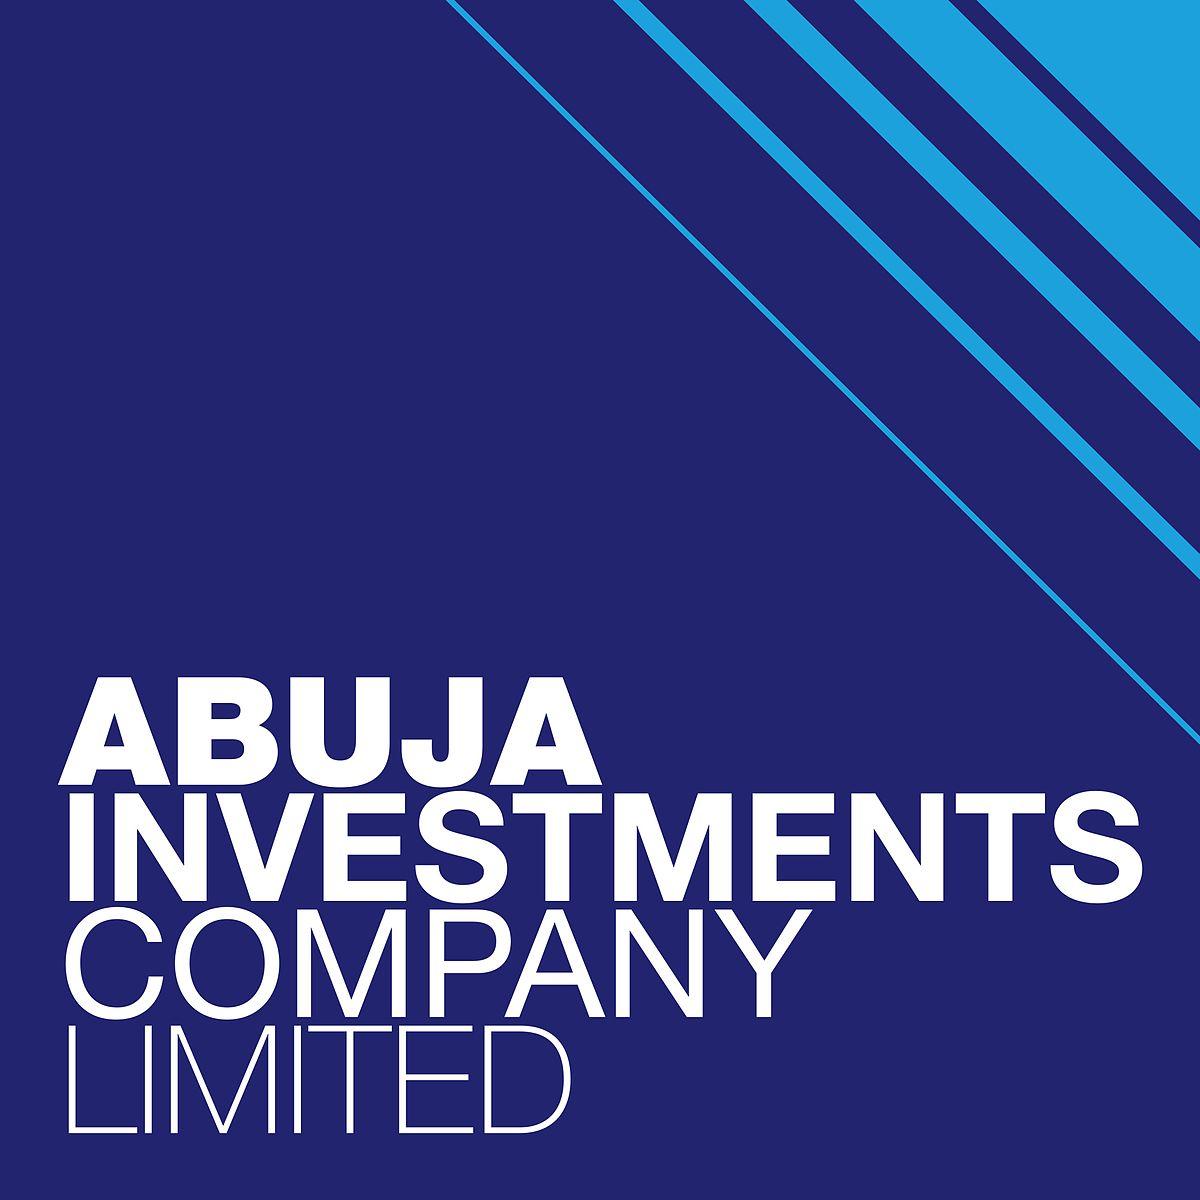 abuja investments company wikipedia